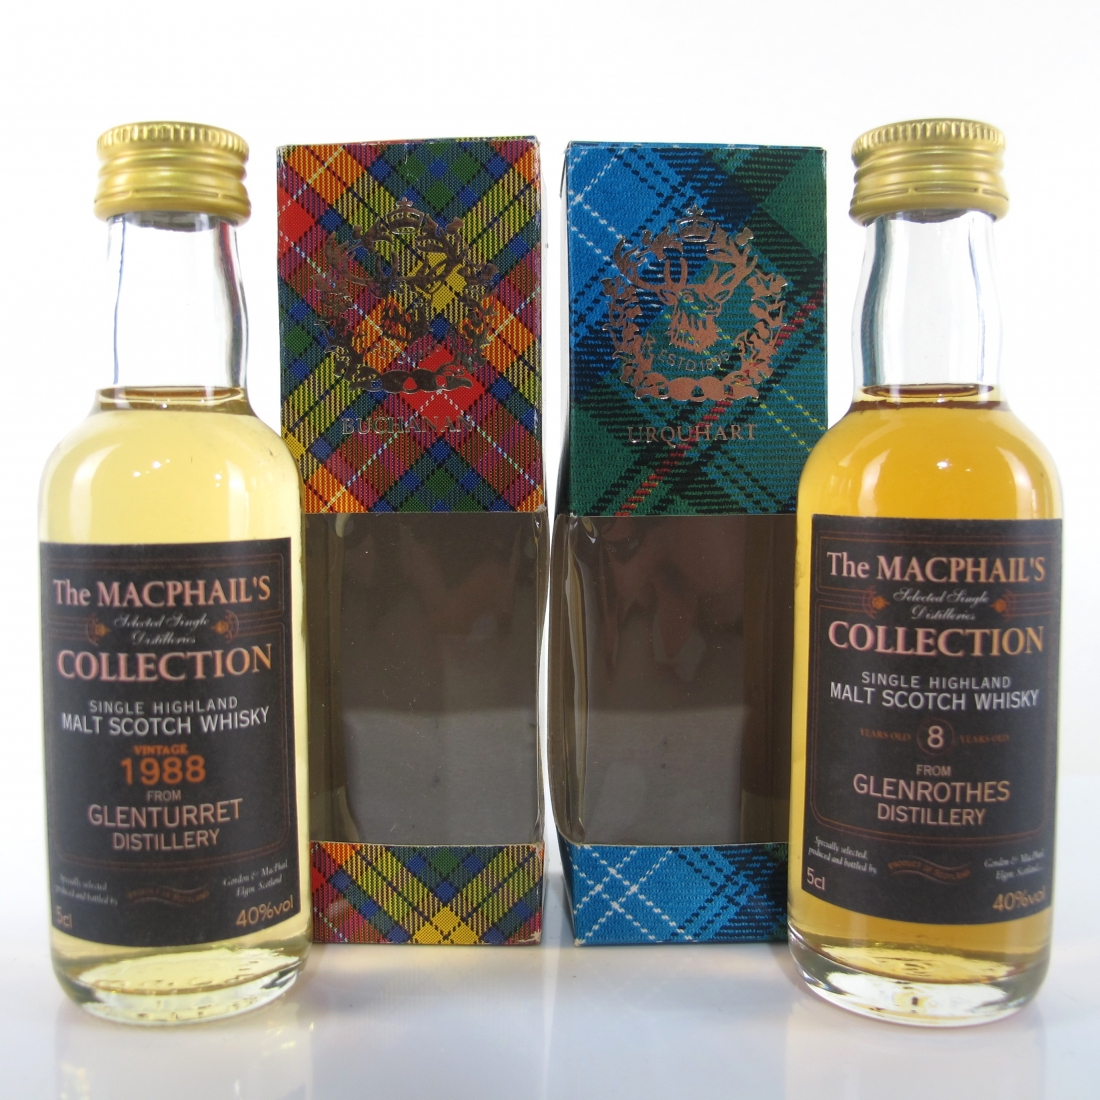 Miscellaneous Gordon and MacPhail Miniature Selection 2 x 5cl